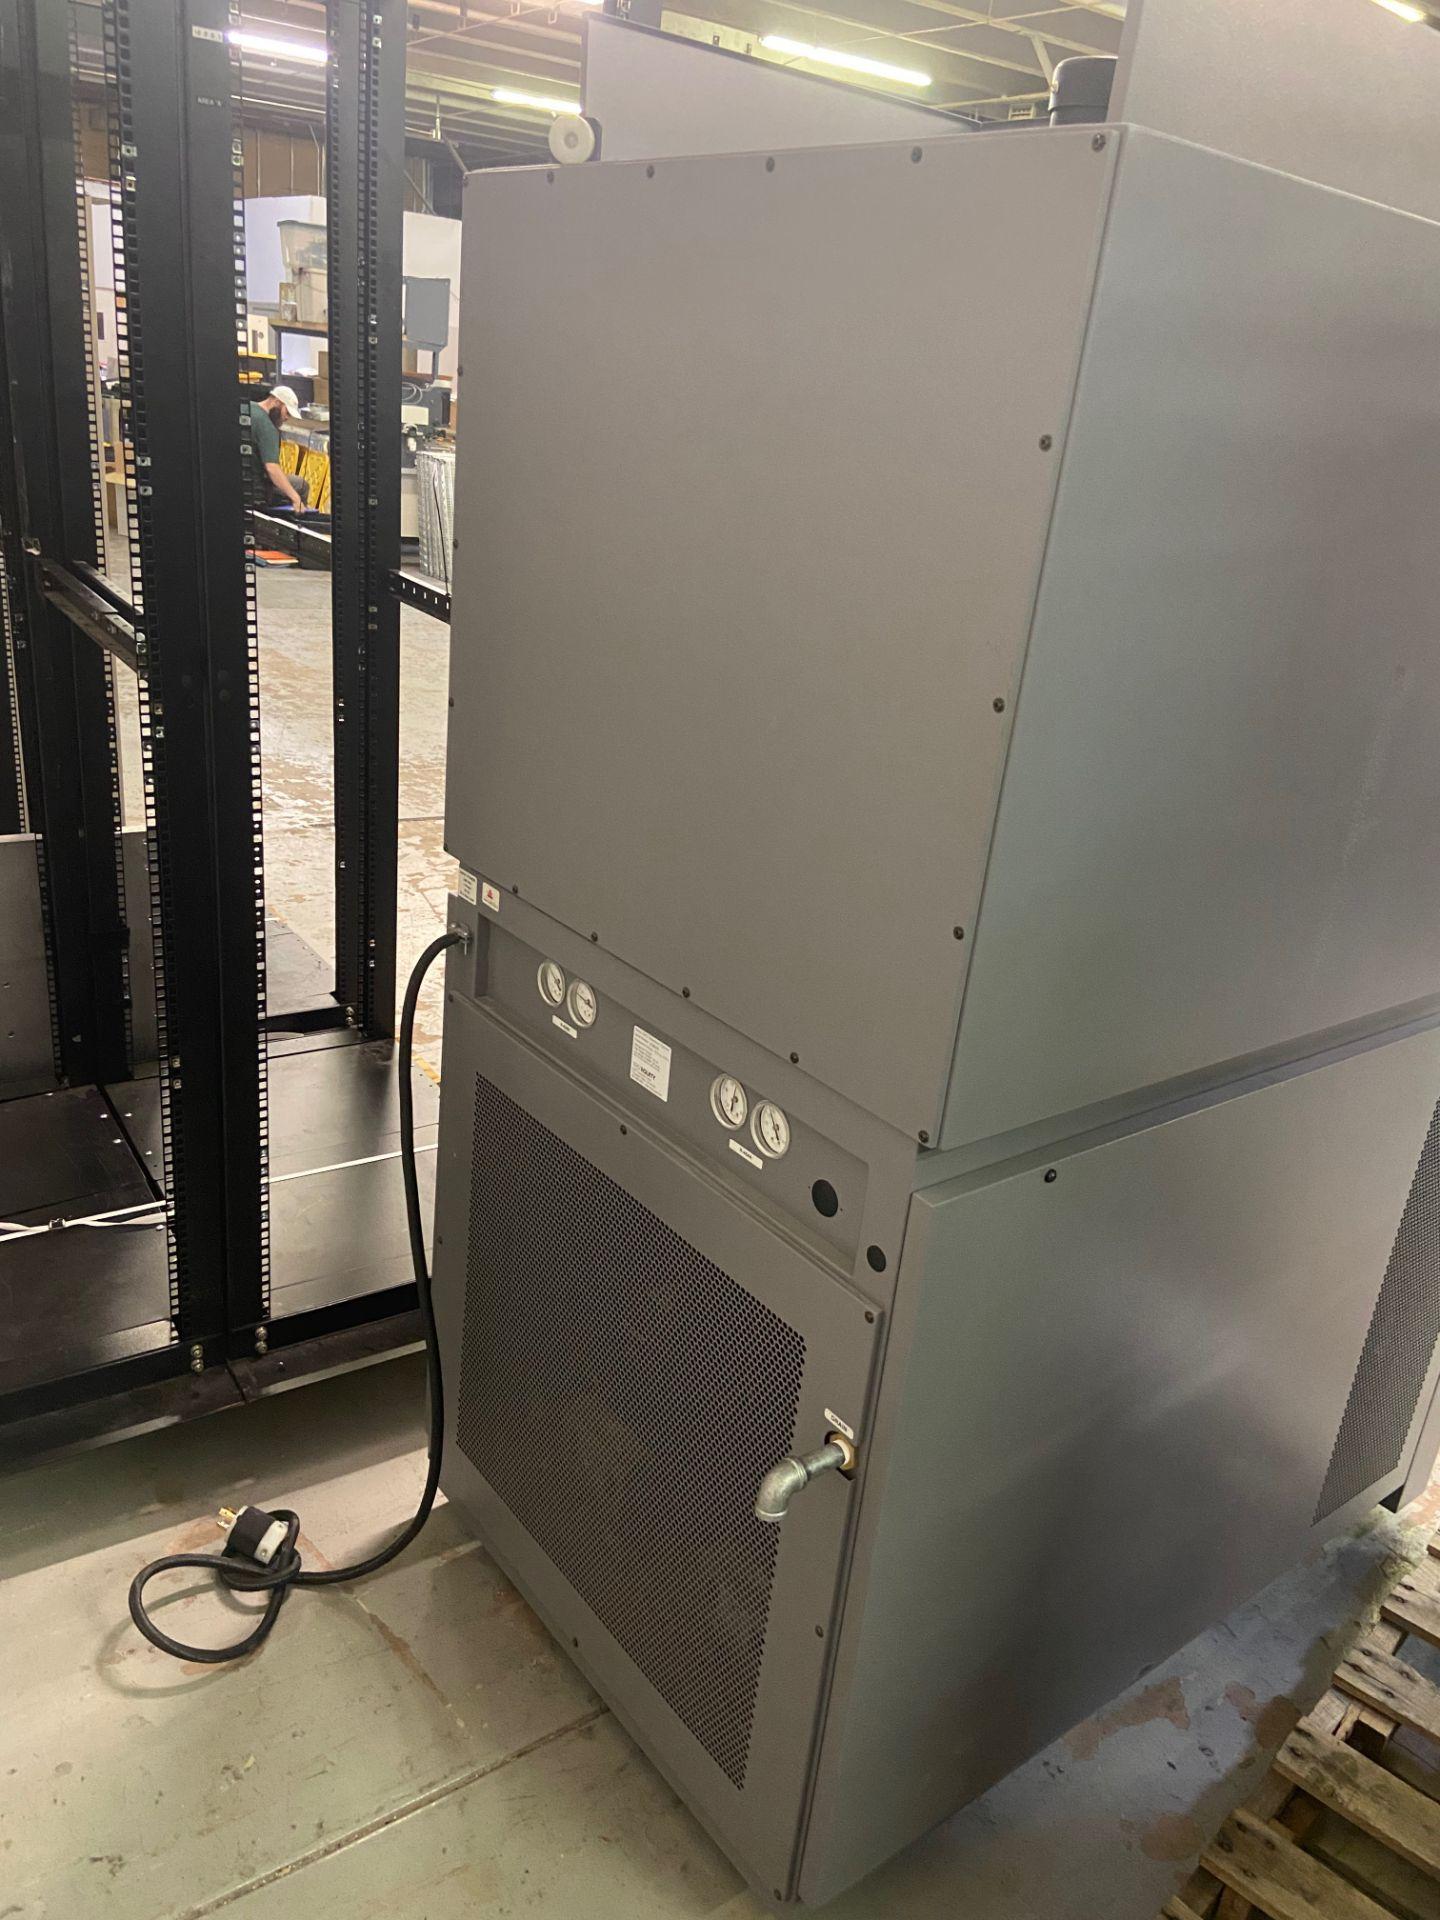 TestEquity Temperature Chamber, Model# 1007C, Serial# 10940, Temp Range: -75C to +175C, 208V, Single - Image 8 of 12